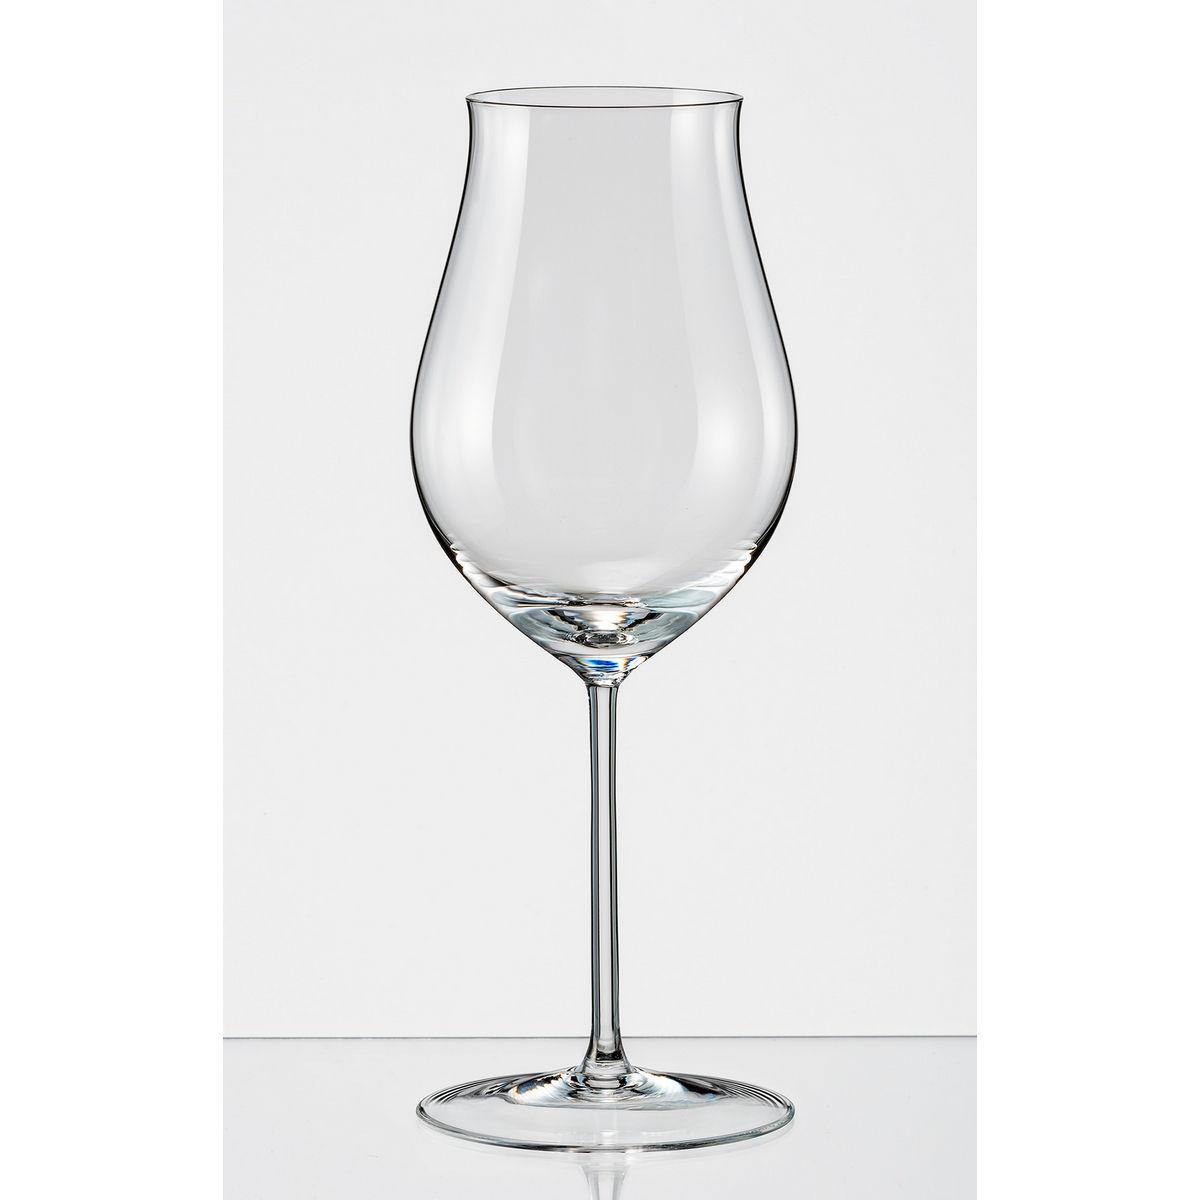 ATTIMO Set 6 pahare cristalin vin 420 ml